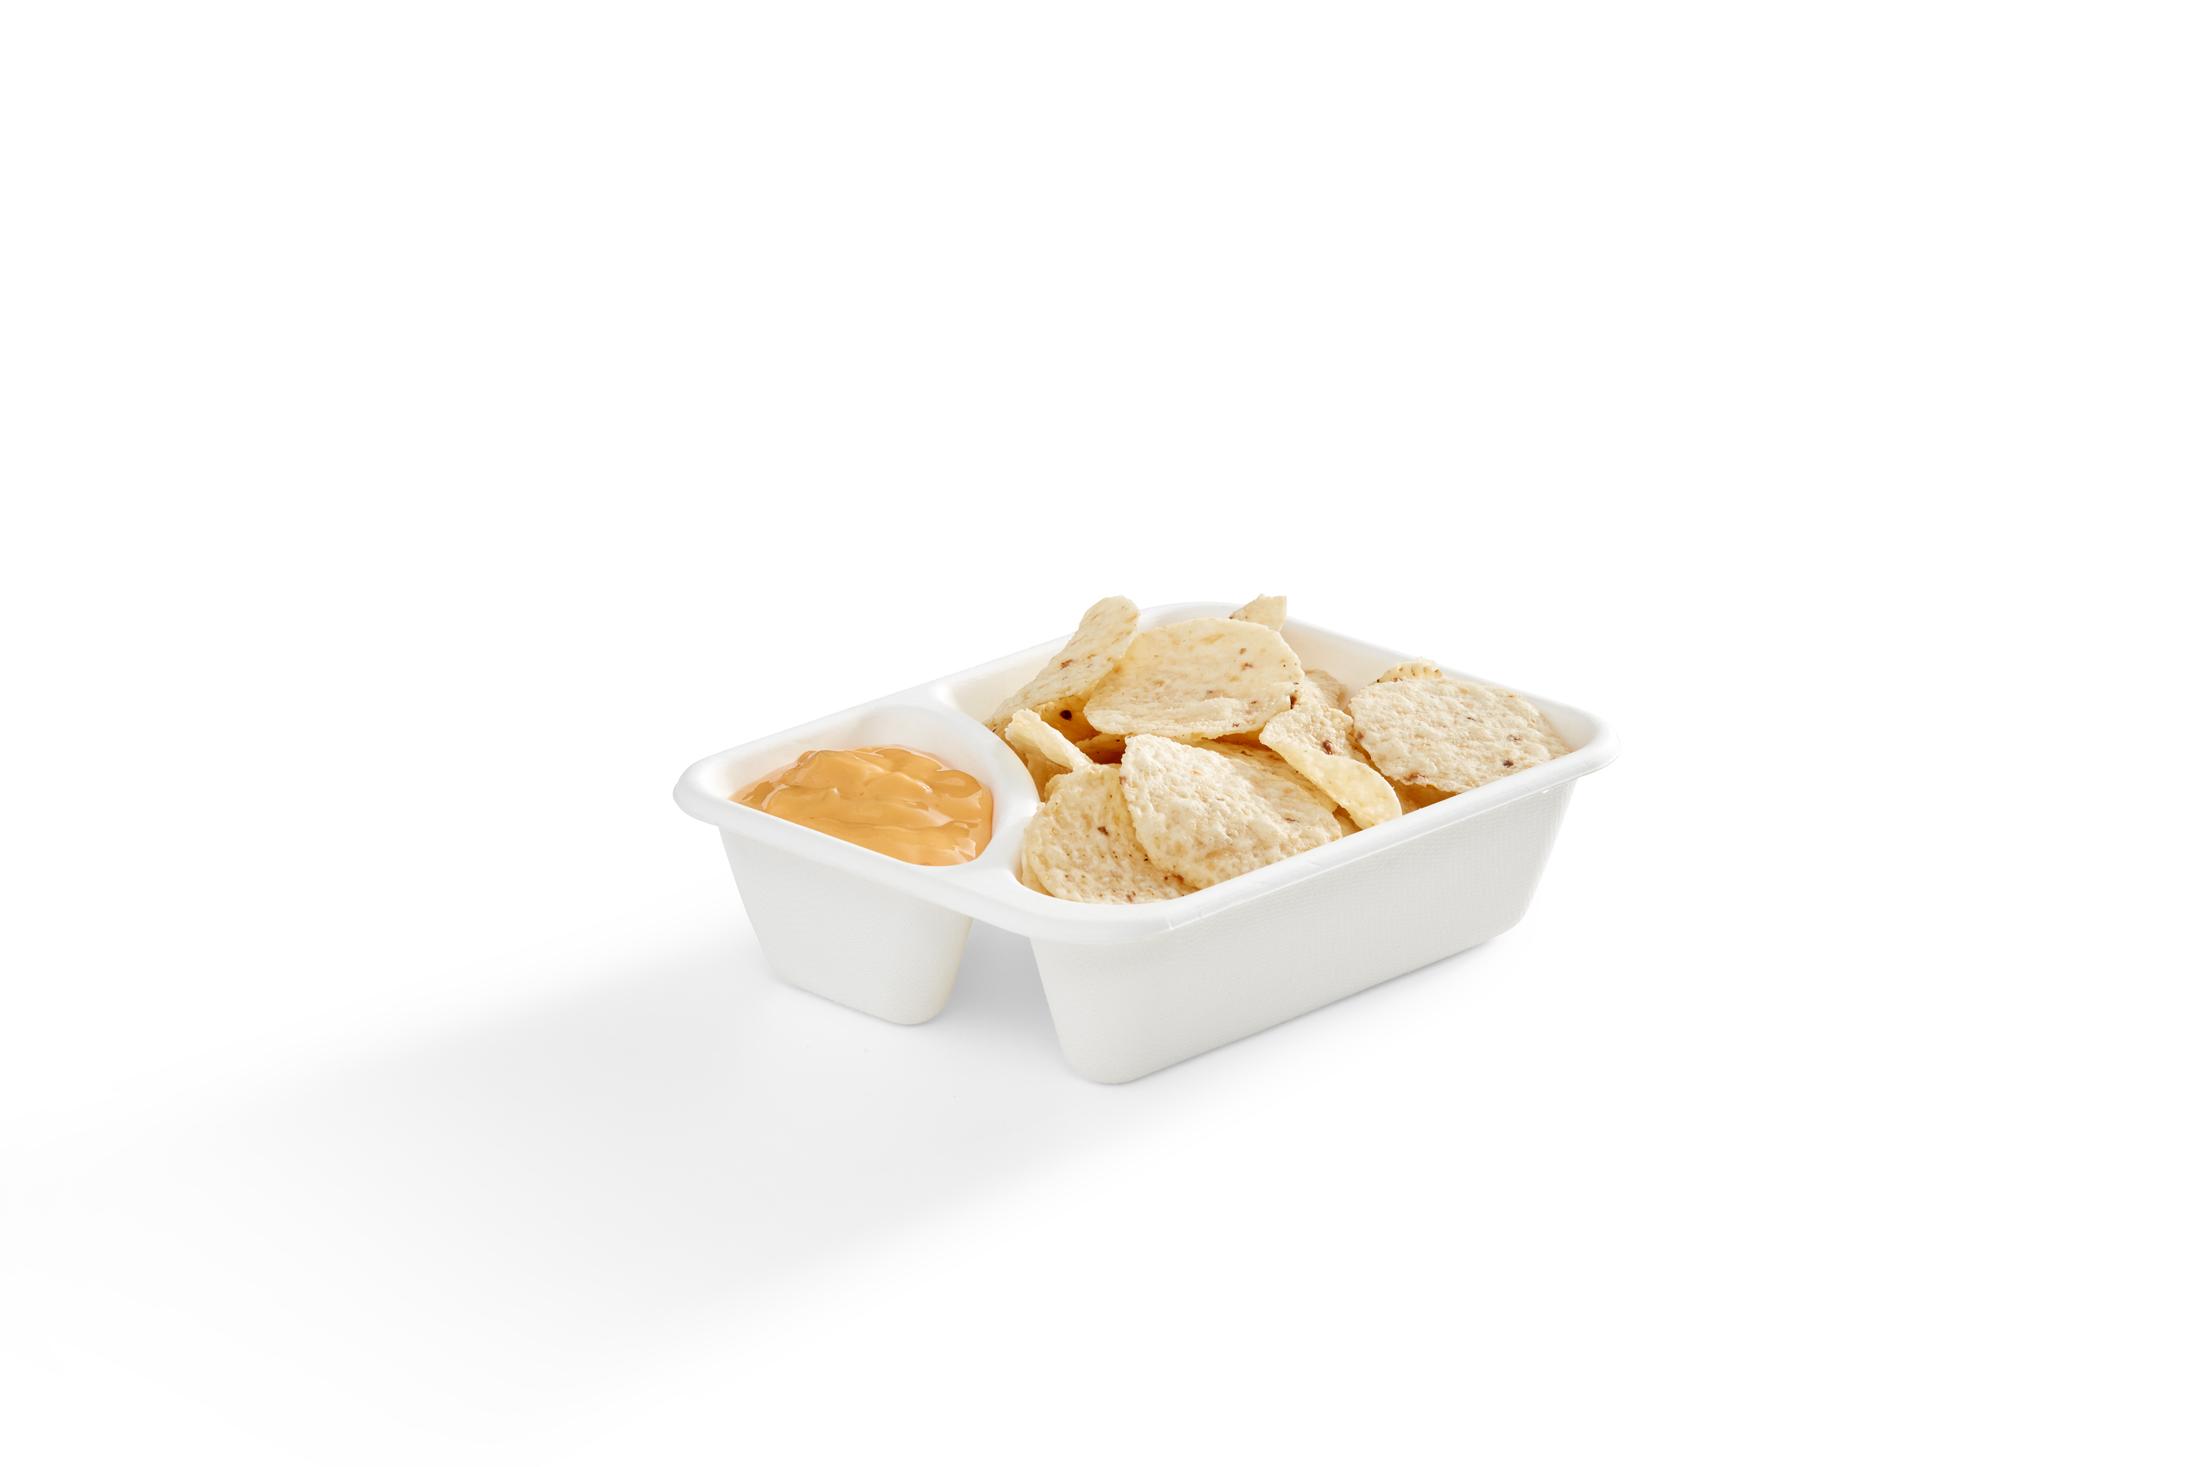 EG-NT-01-W-FOOD 2-Compartment Nacho Tray